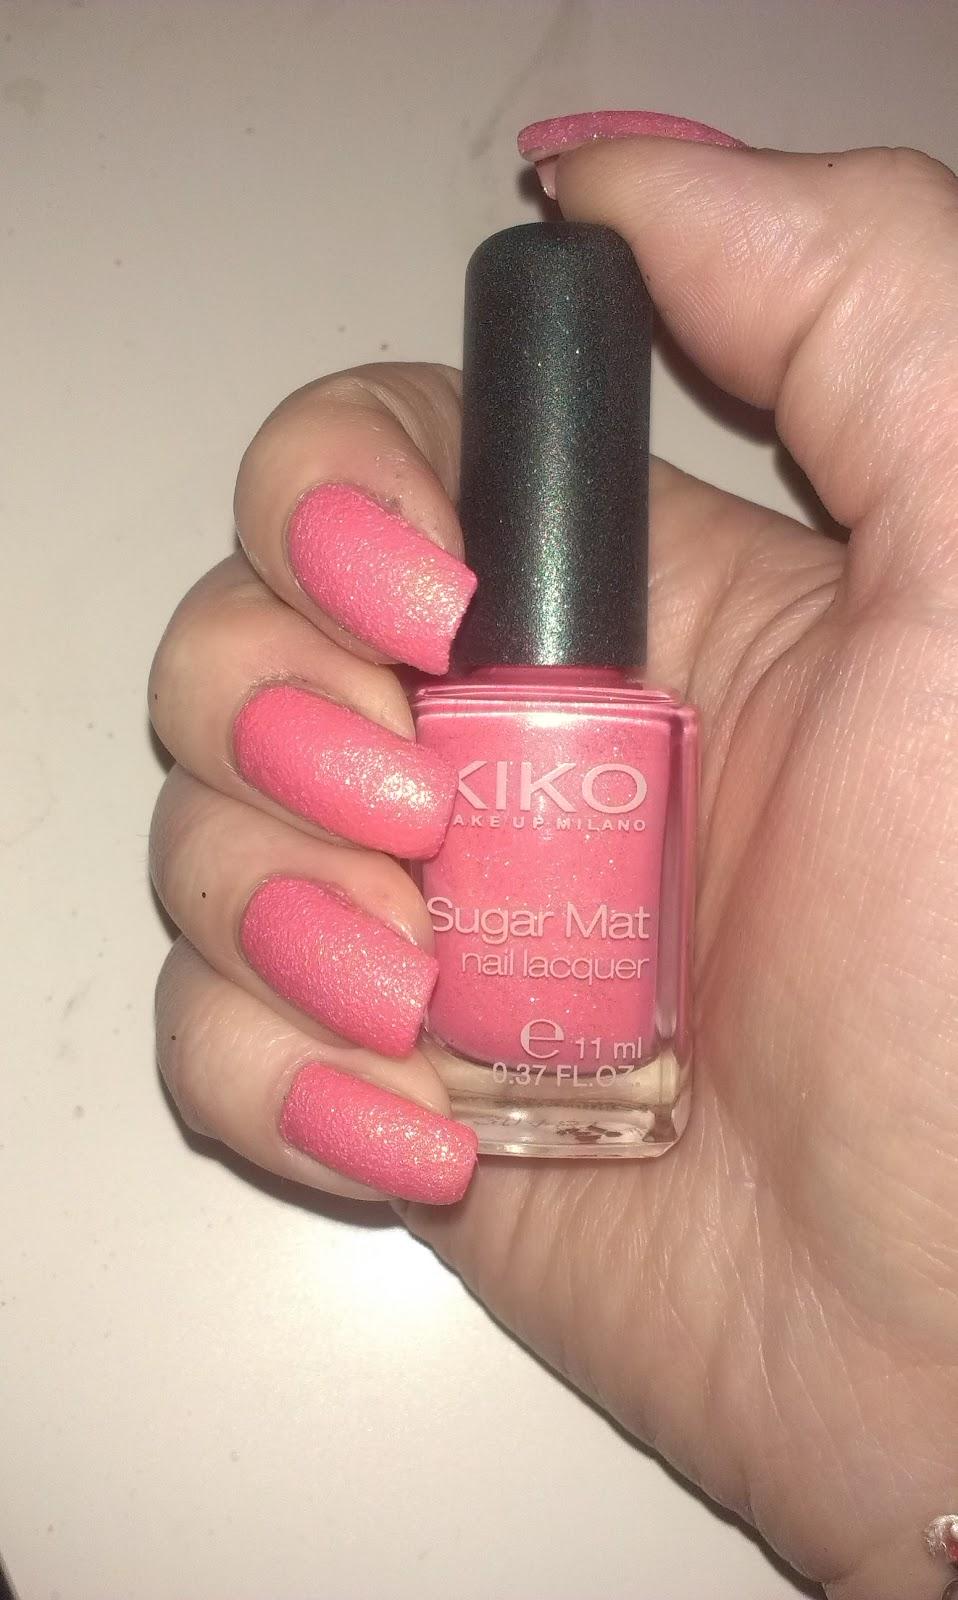 Elle Fabulouse: Nuevo en: Kiko Make up Milano, Sugar Matt Nail Lacquer